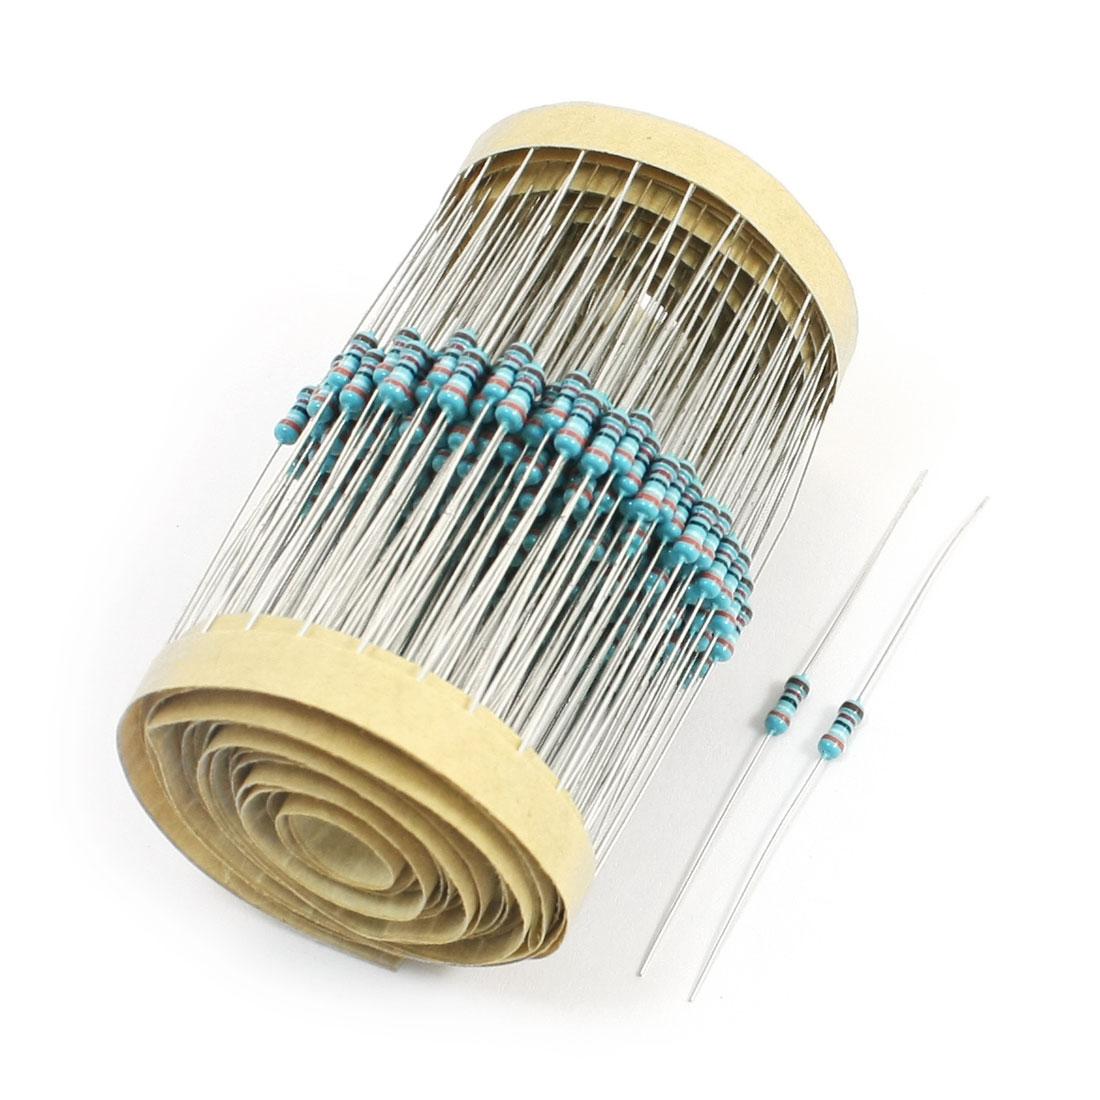 300Pcs Axial Lead Through Hole 0.25W 1% 39K Ohm Metal Film Resistor